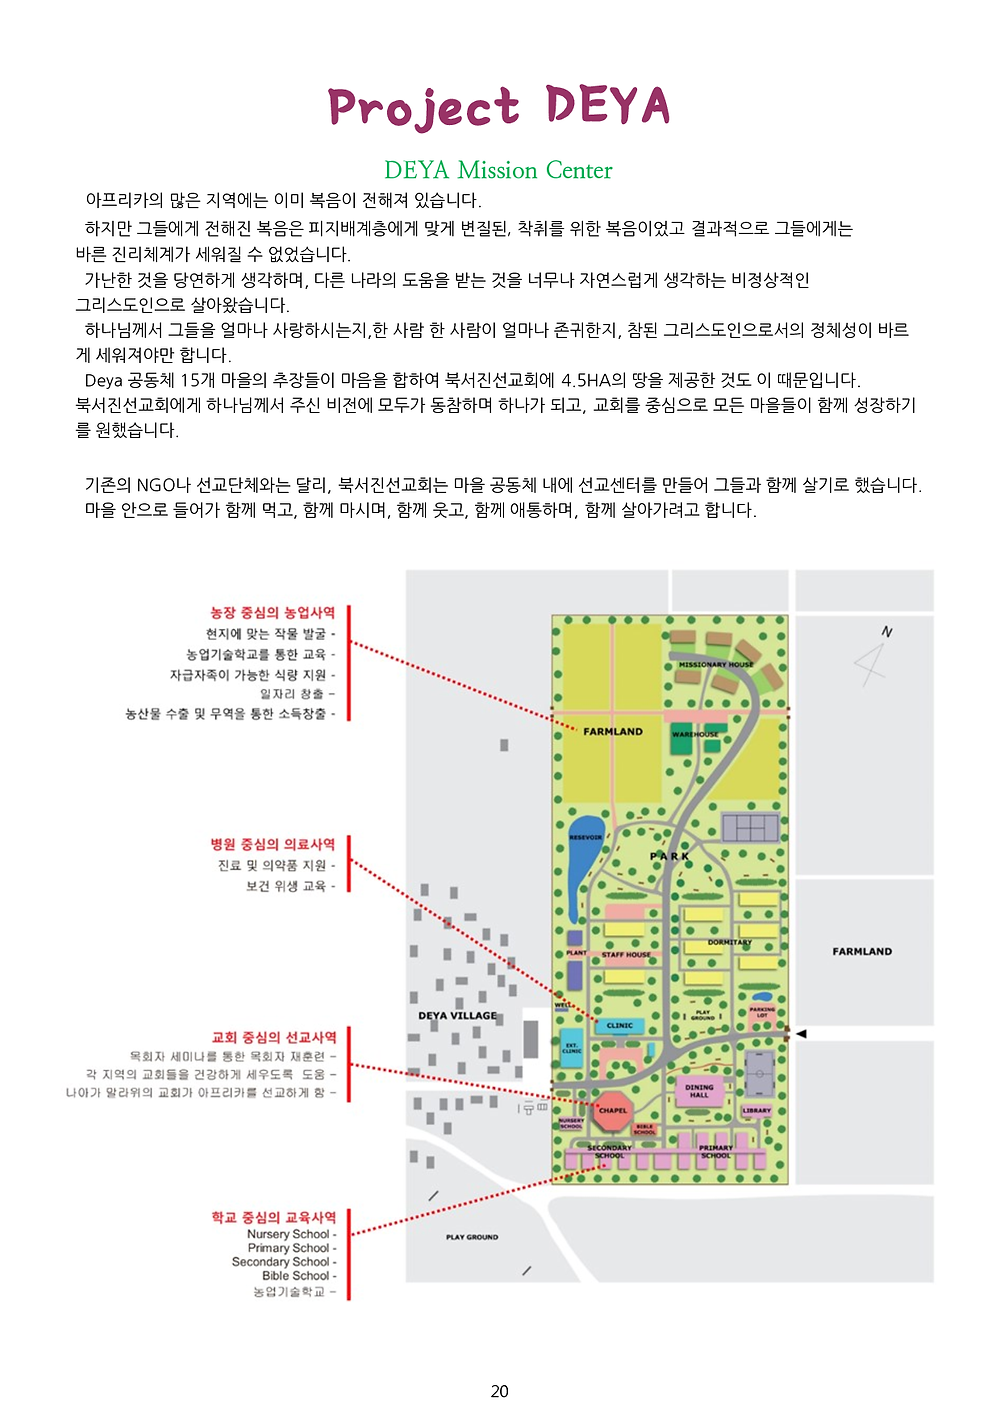 NWM 2014년 선교보고_20.png